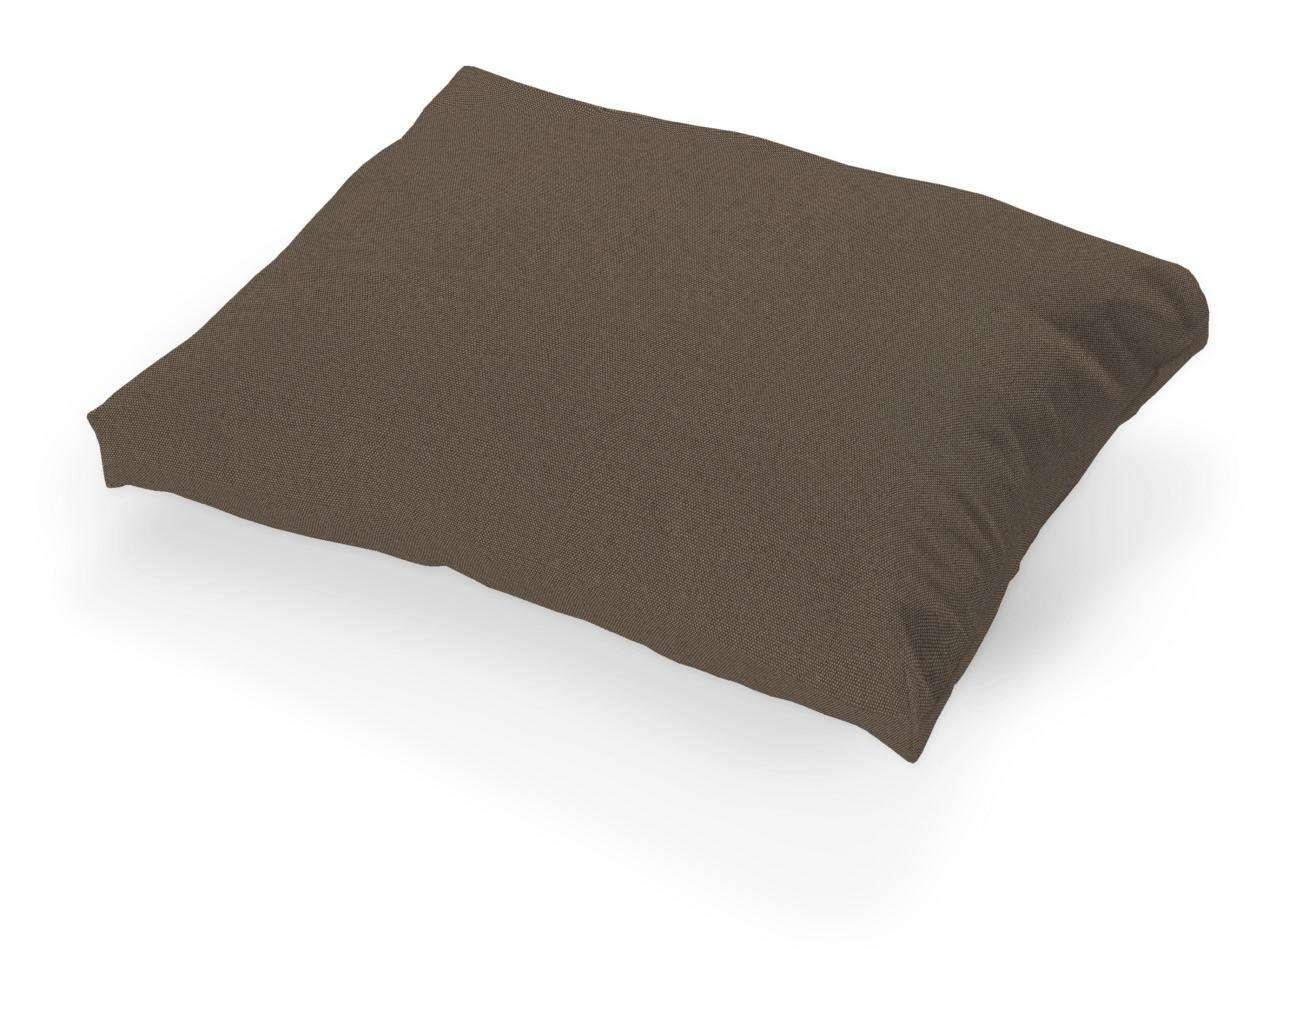 Tylösand pagalvėlės užvalkalas Tylösand pagalvėlė kolekcijoje Etna , audinys: 705-08